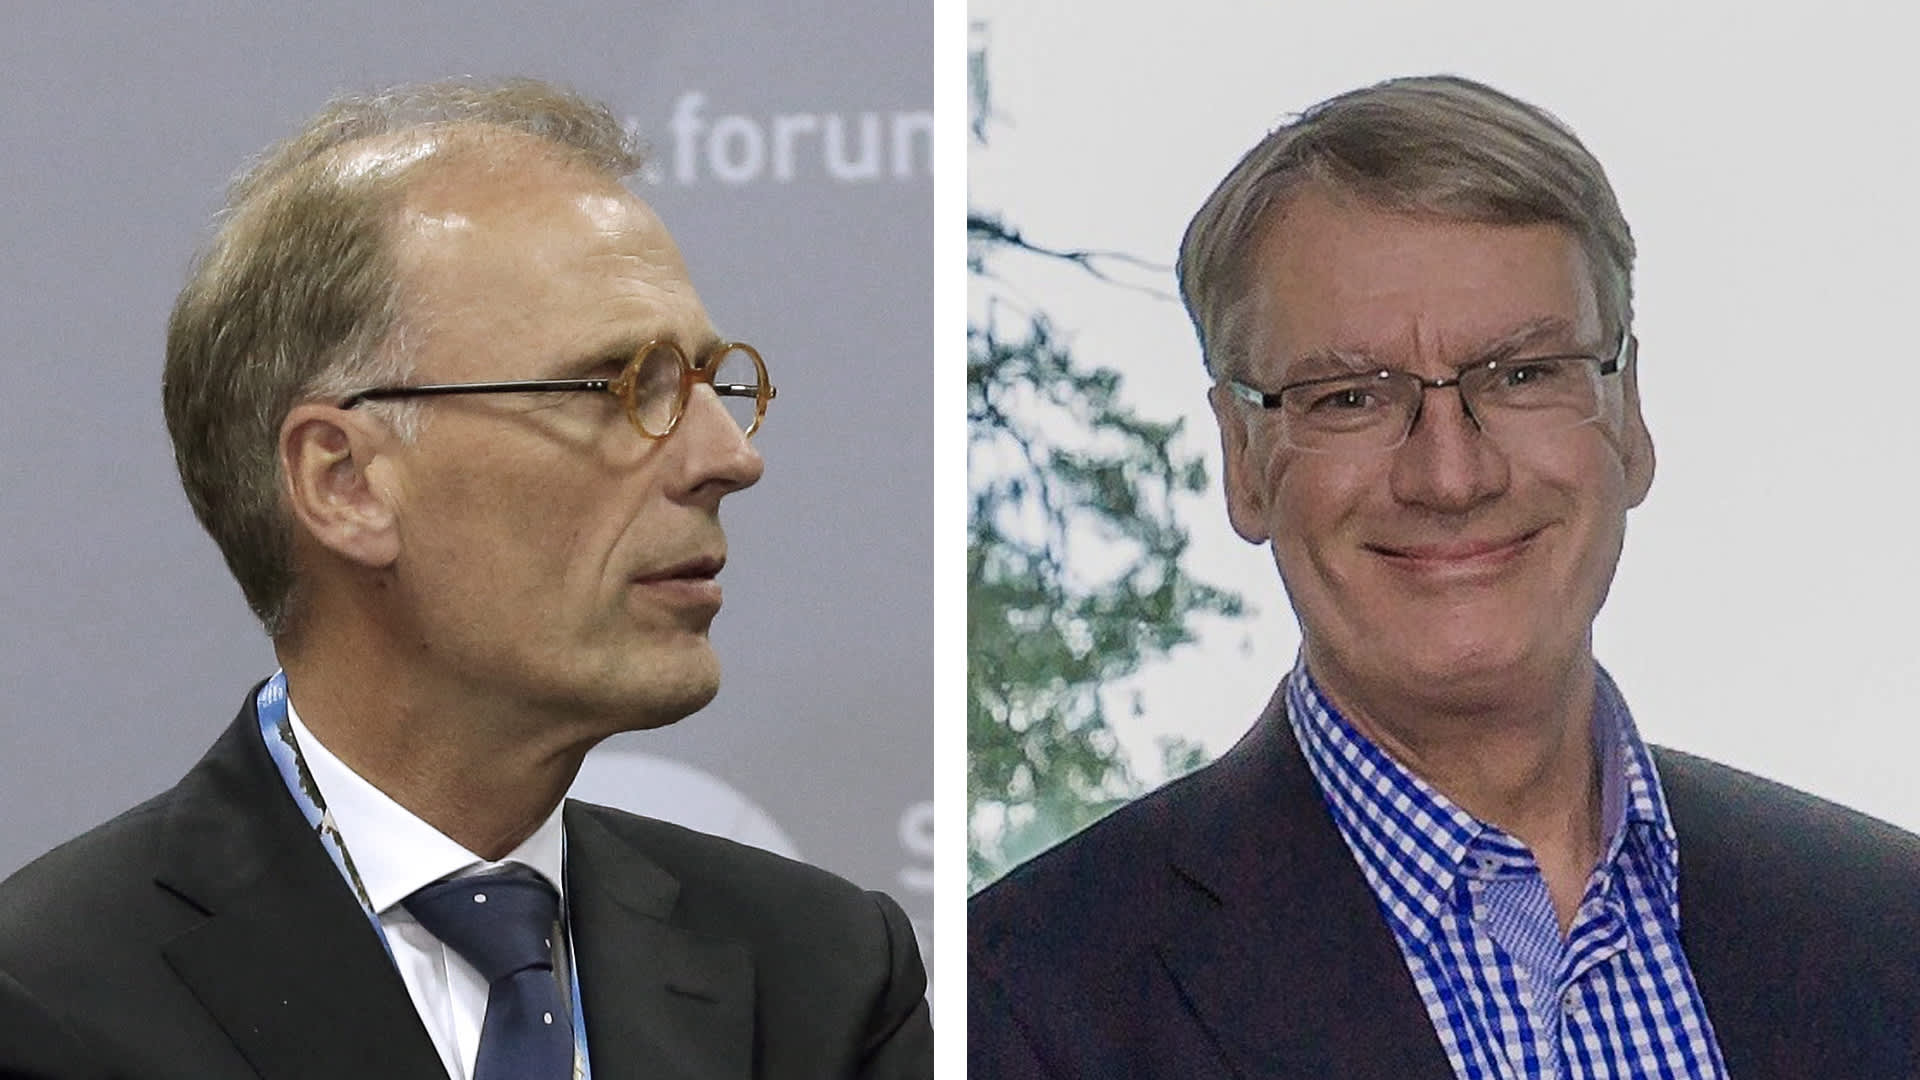 Carlsbergin toimitusjohtaja Cees't Hart ja Olvin toimitusjohtaja Lasse Aho.